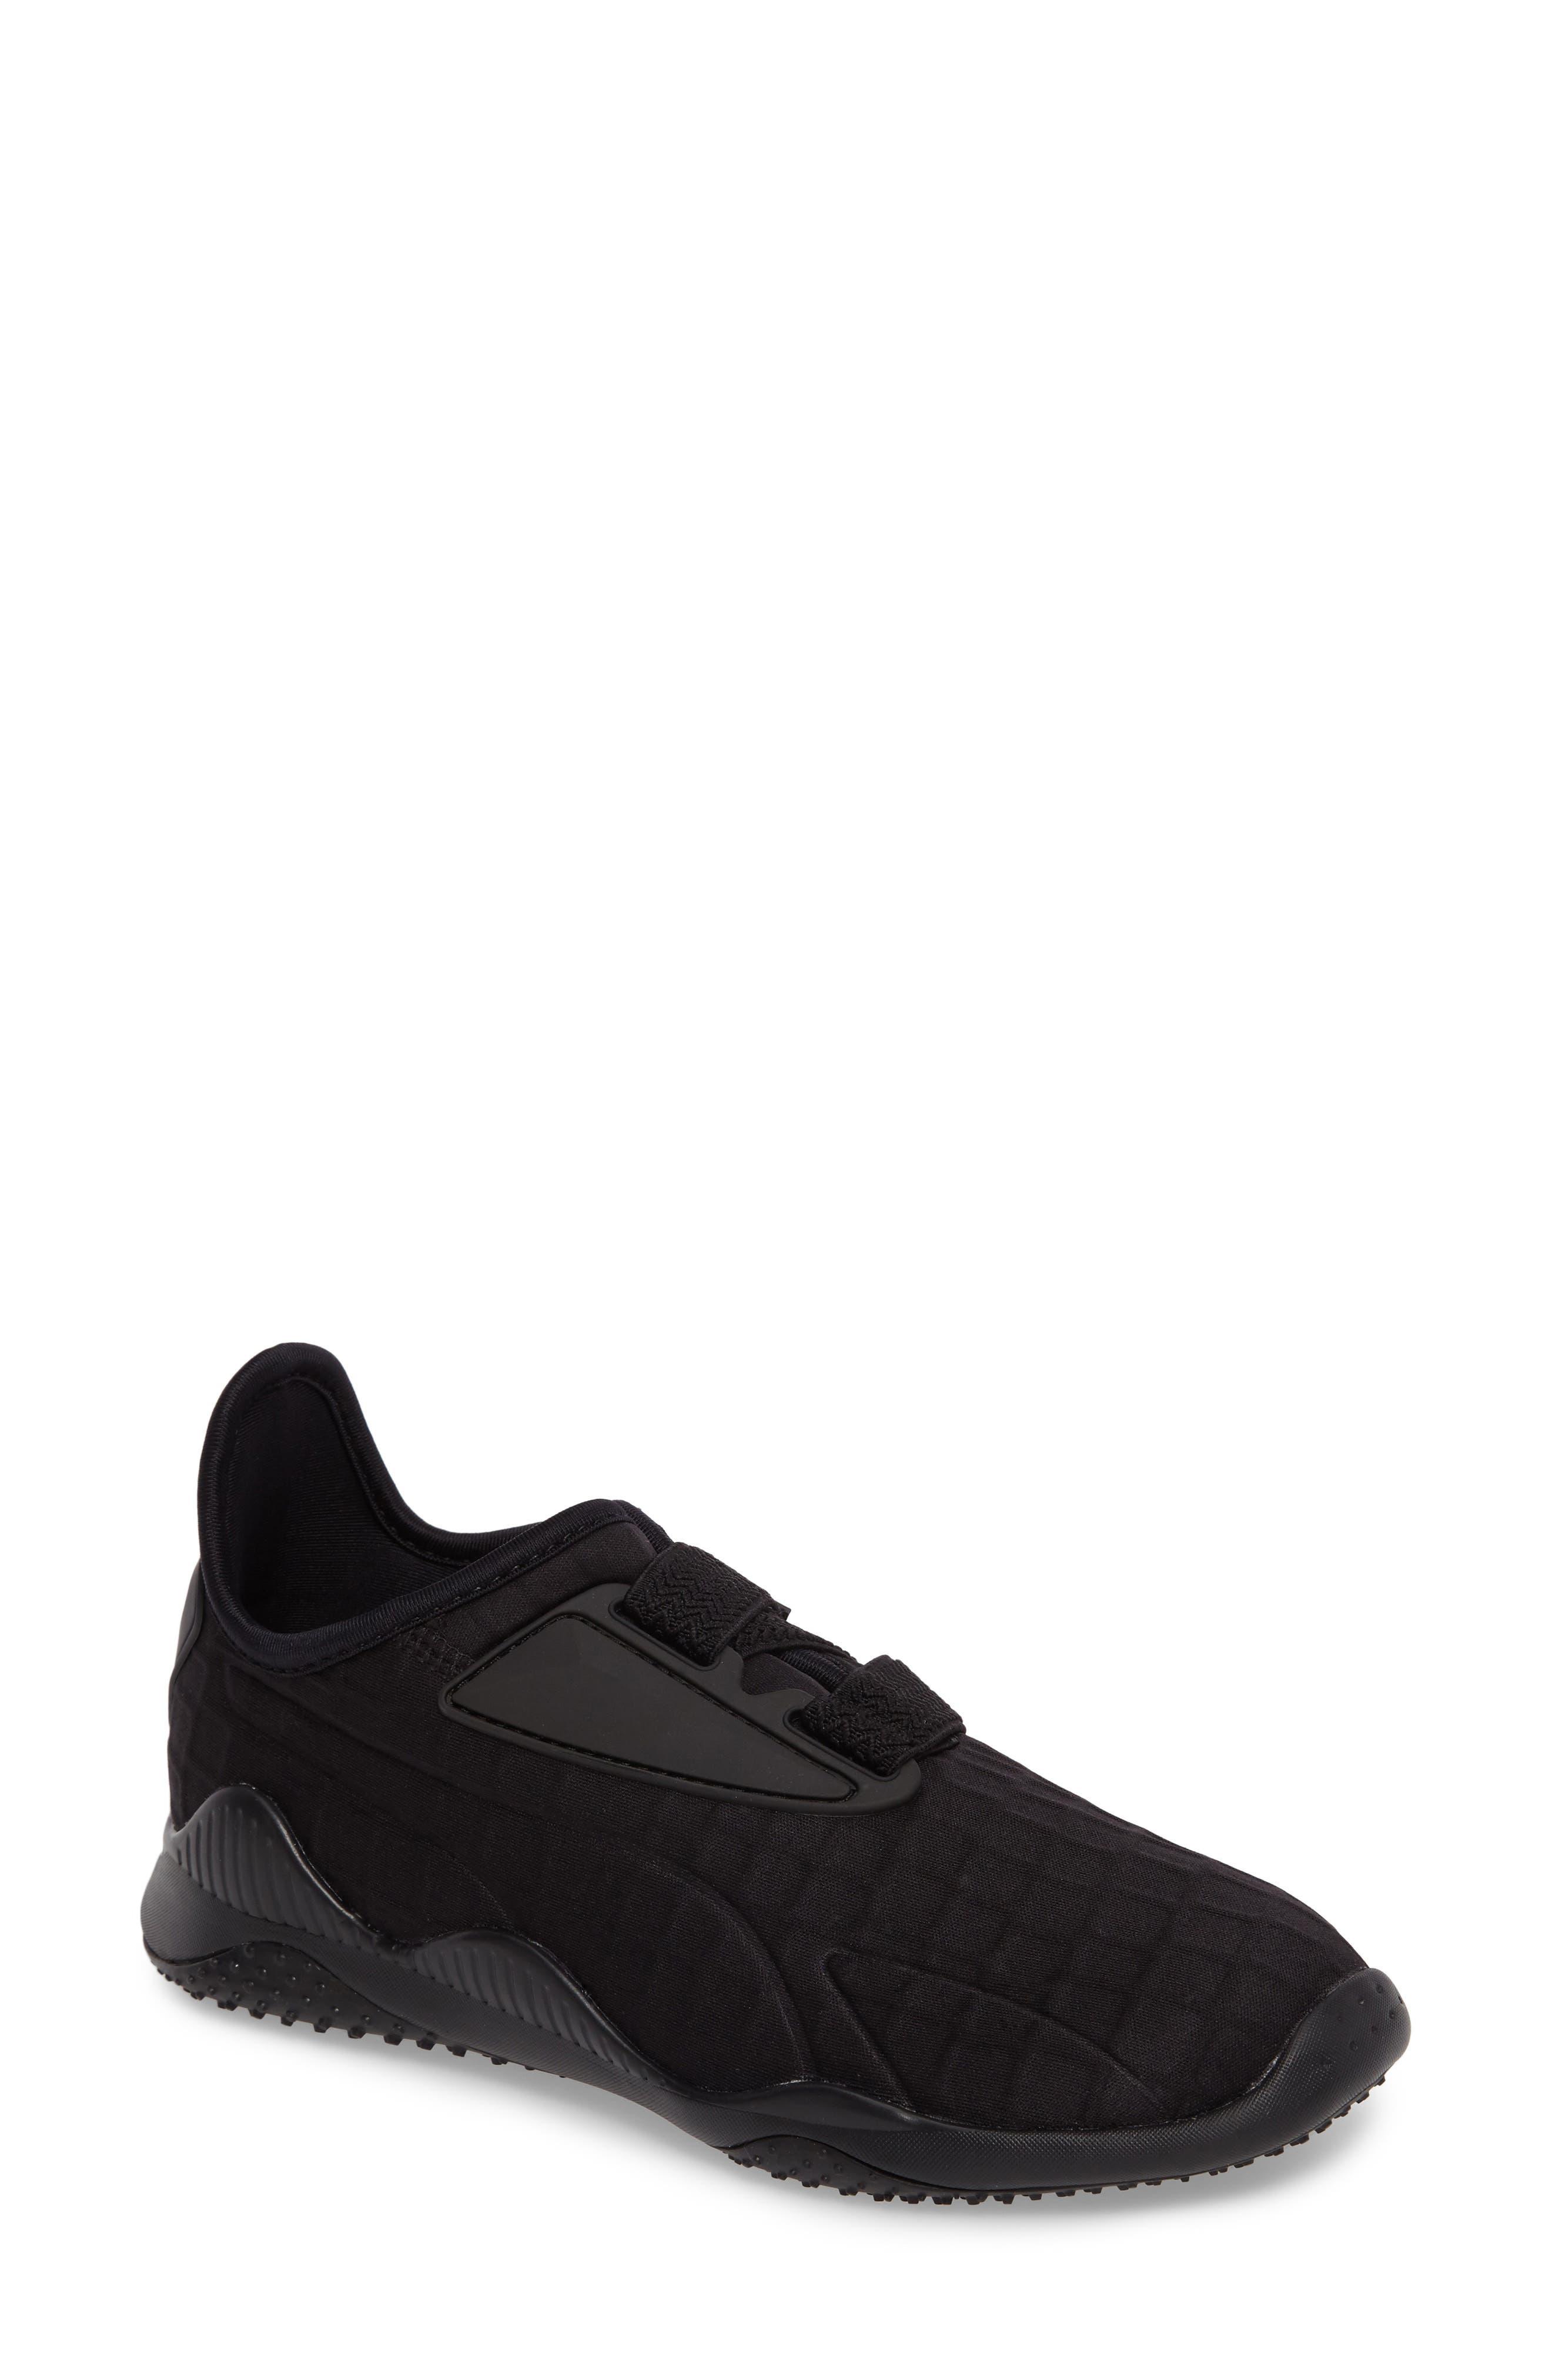 Mostro Fashion Sneaker,                             Main thumbnail 1, color,                             Puma Black/ Puma Black